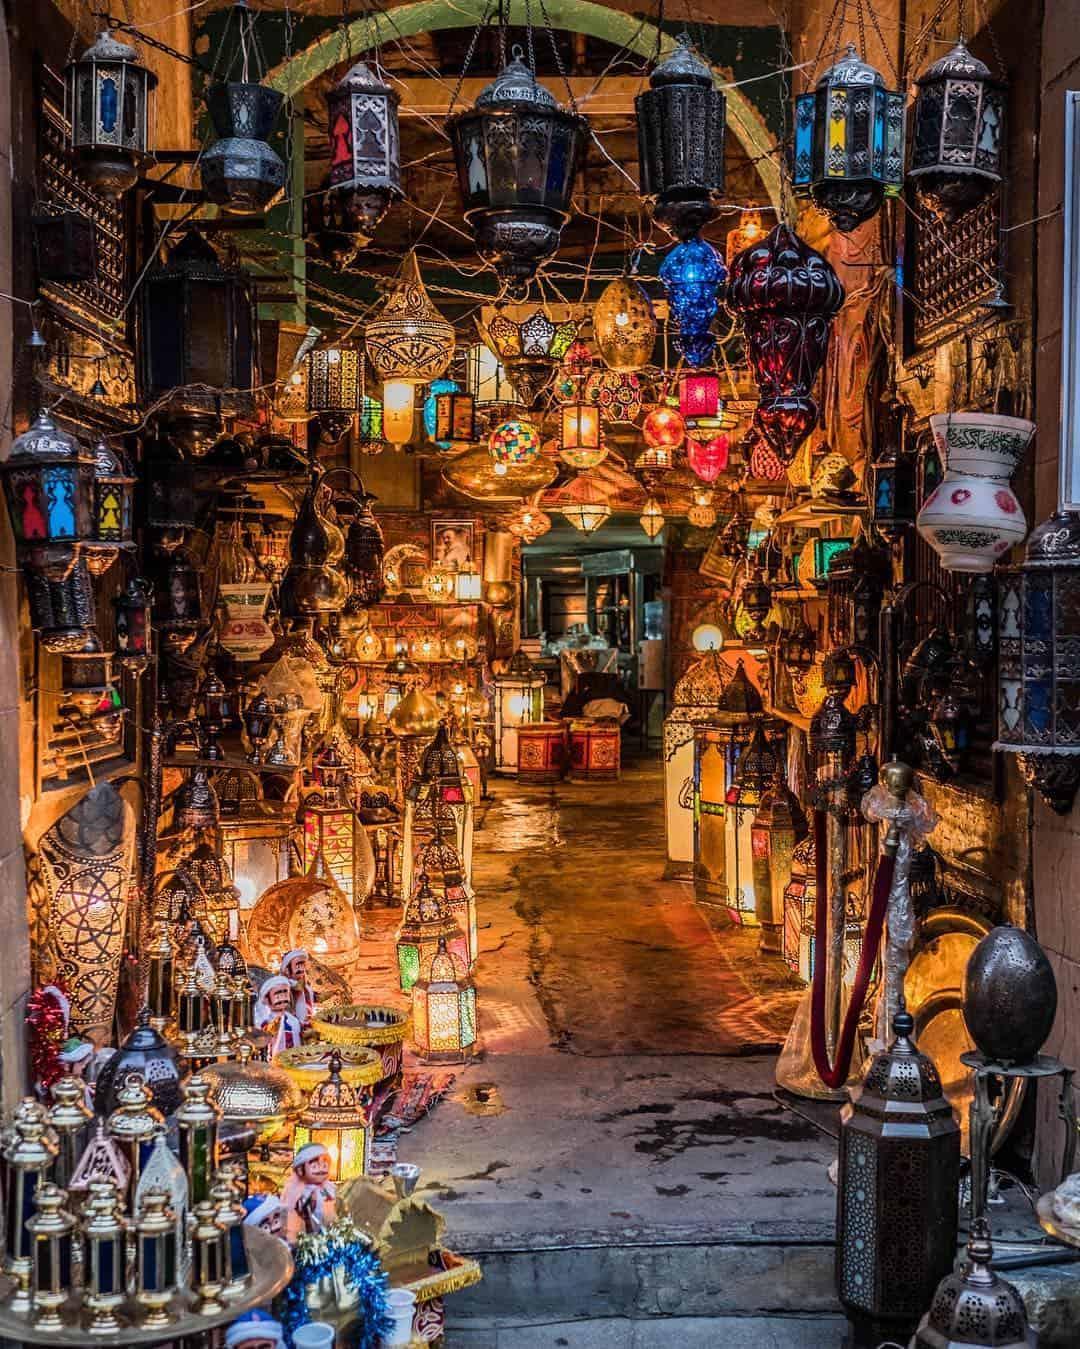 Adventurous Shopping In Khan El Khalili, Egypt's Oldest Bazaar